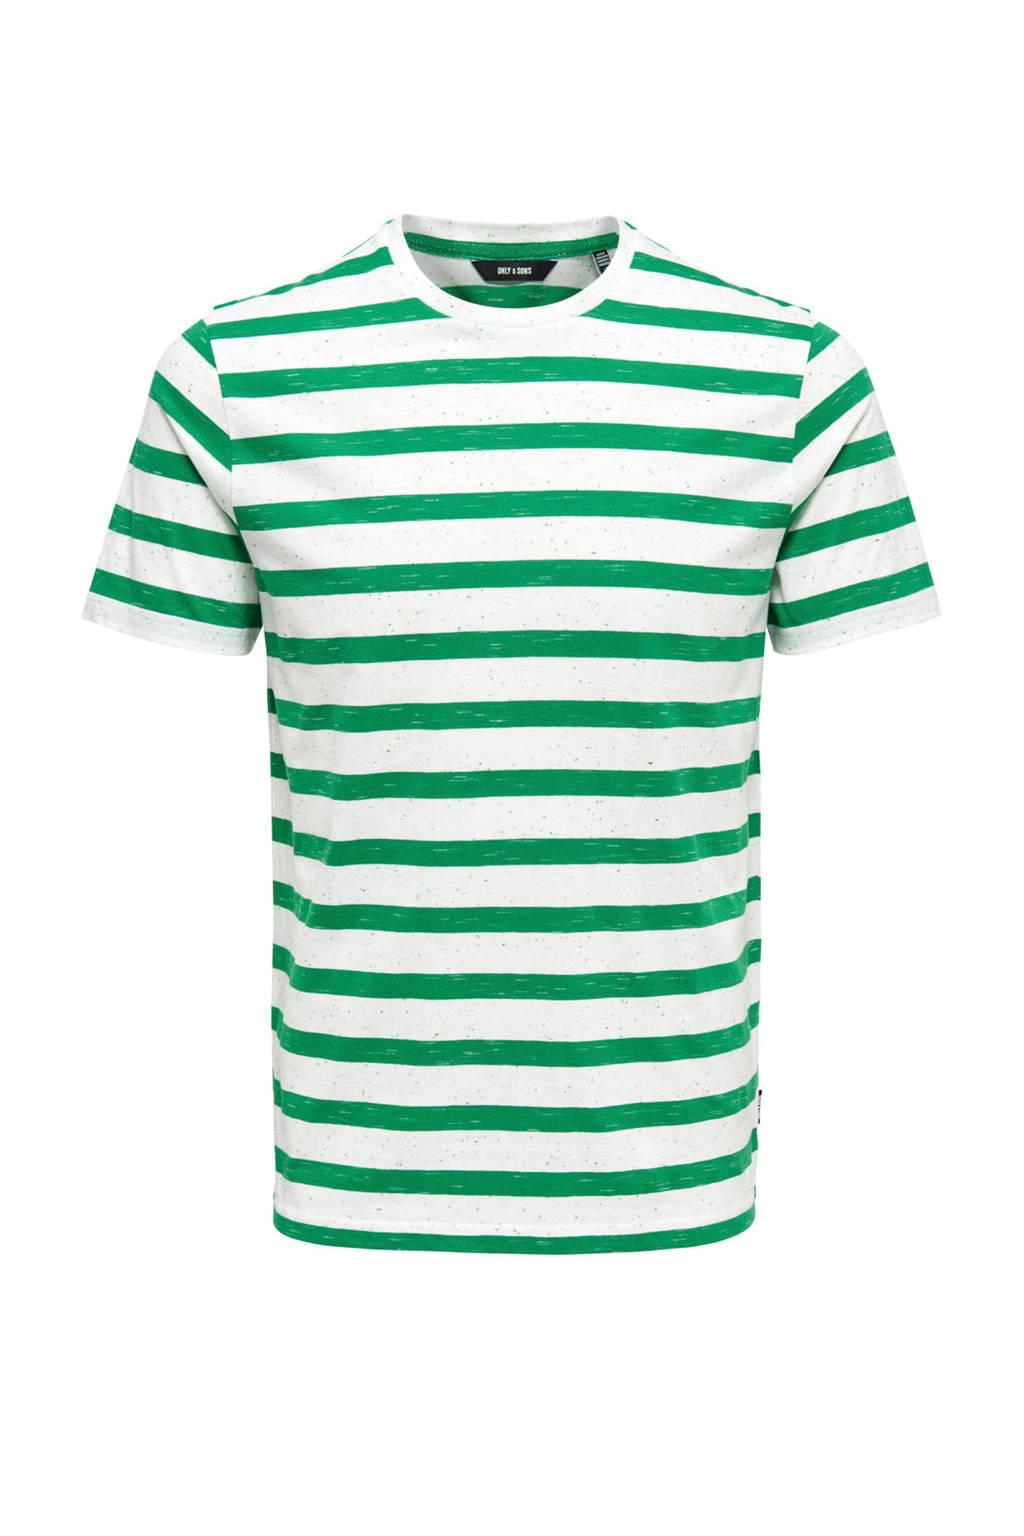 Only & Sons T-shirt met streep, Wit/groen